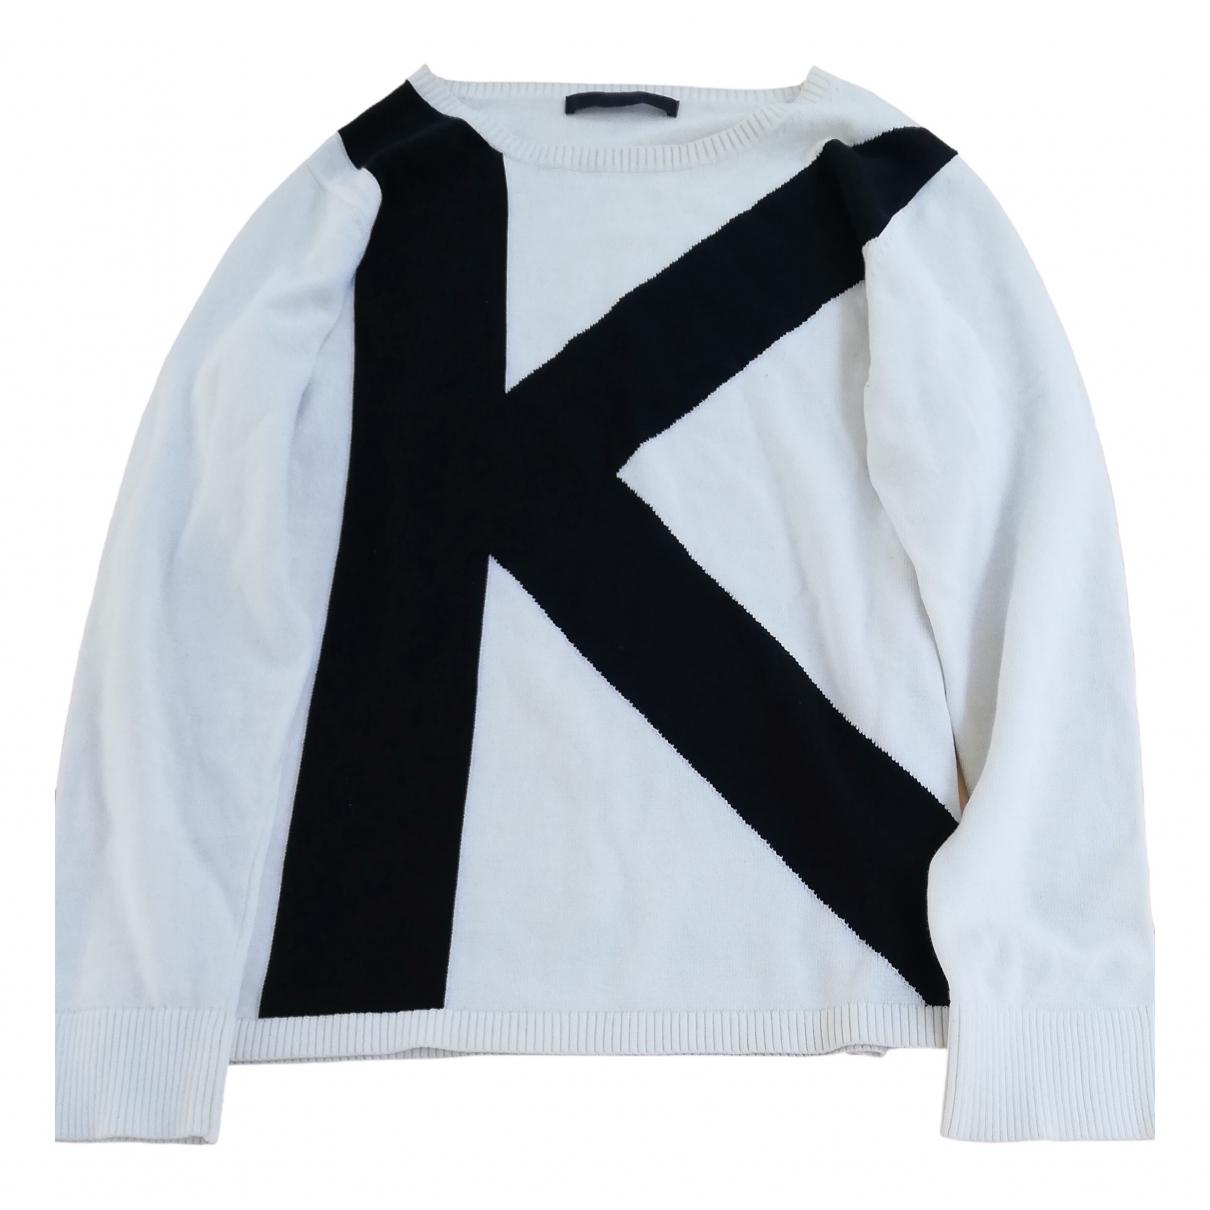 Karl Lagerfeld \N White Cotton Knitwear & Sweatshirts for Men S International